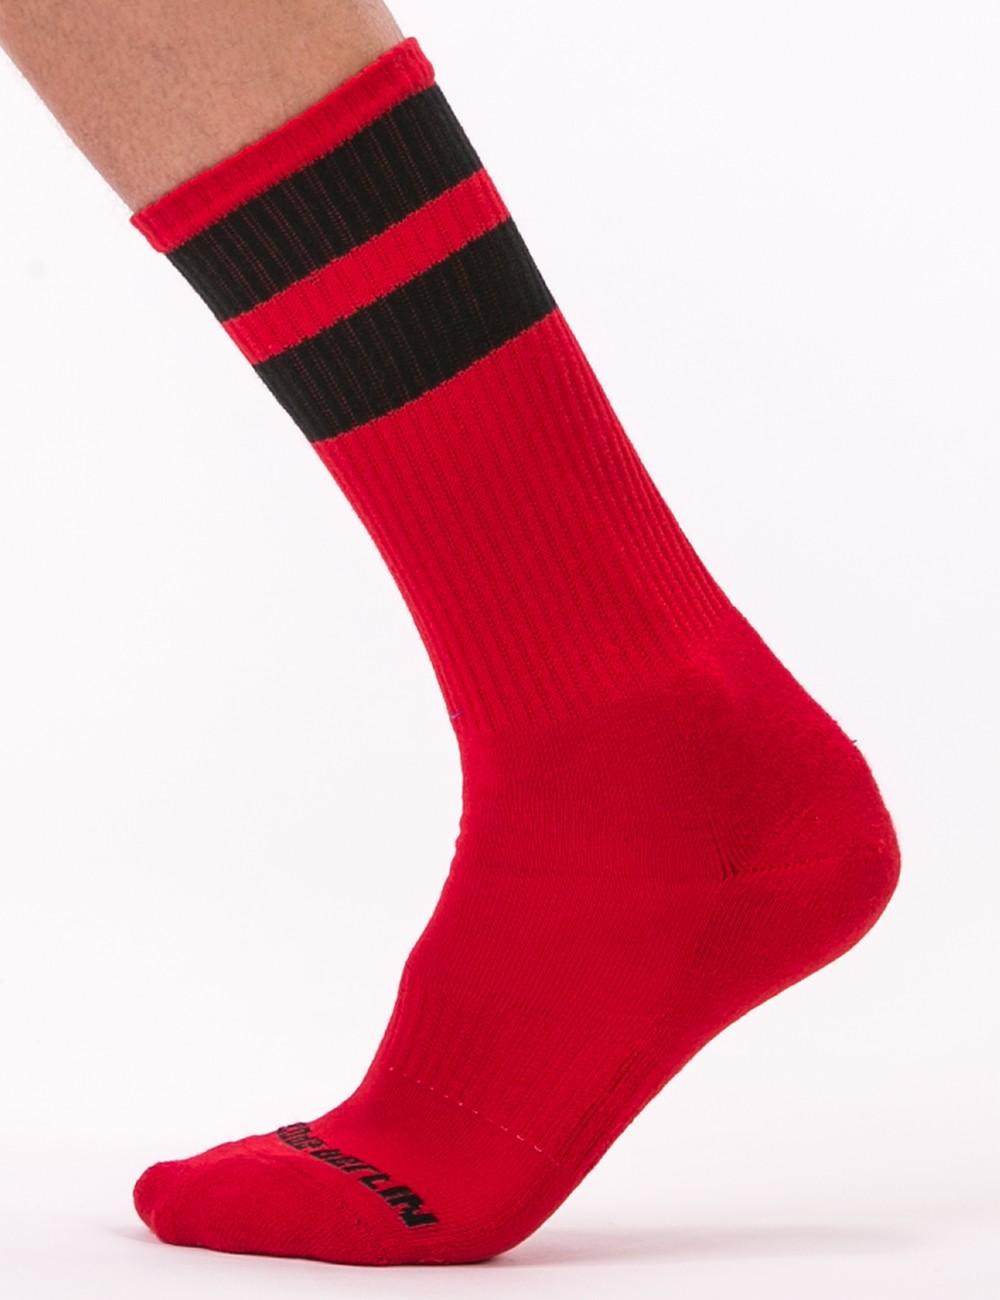 Gym Socks - Red-Black